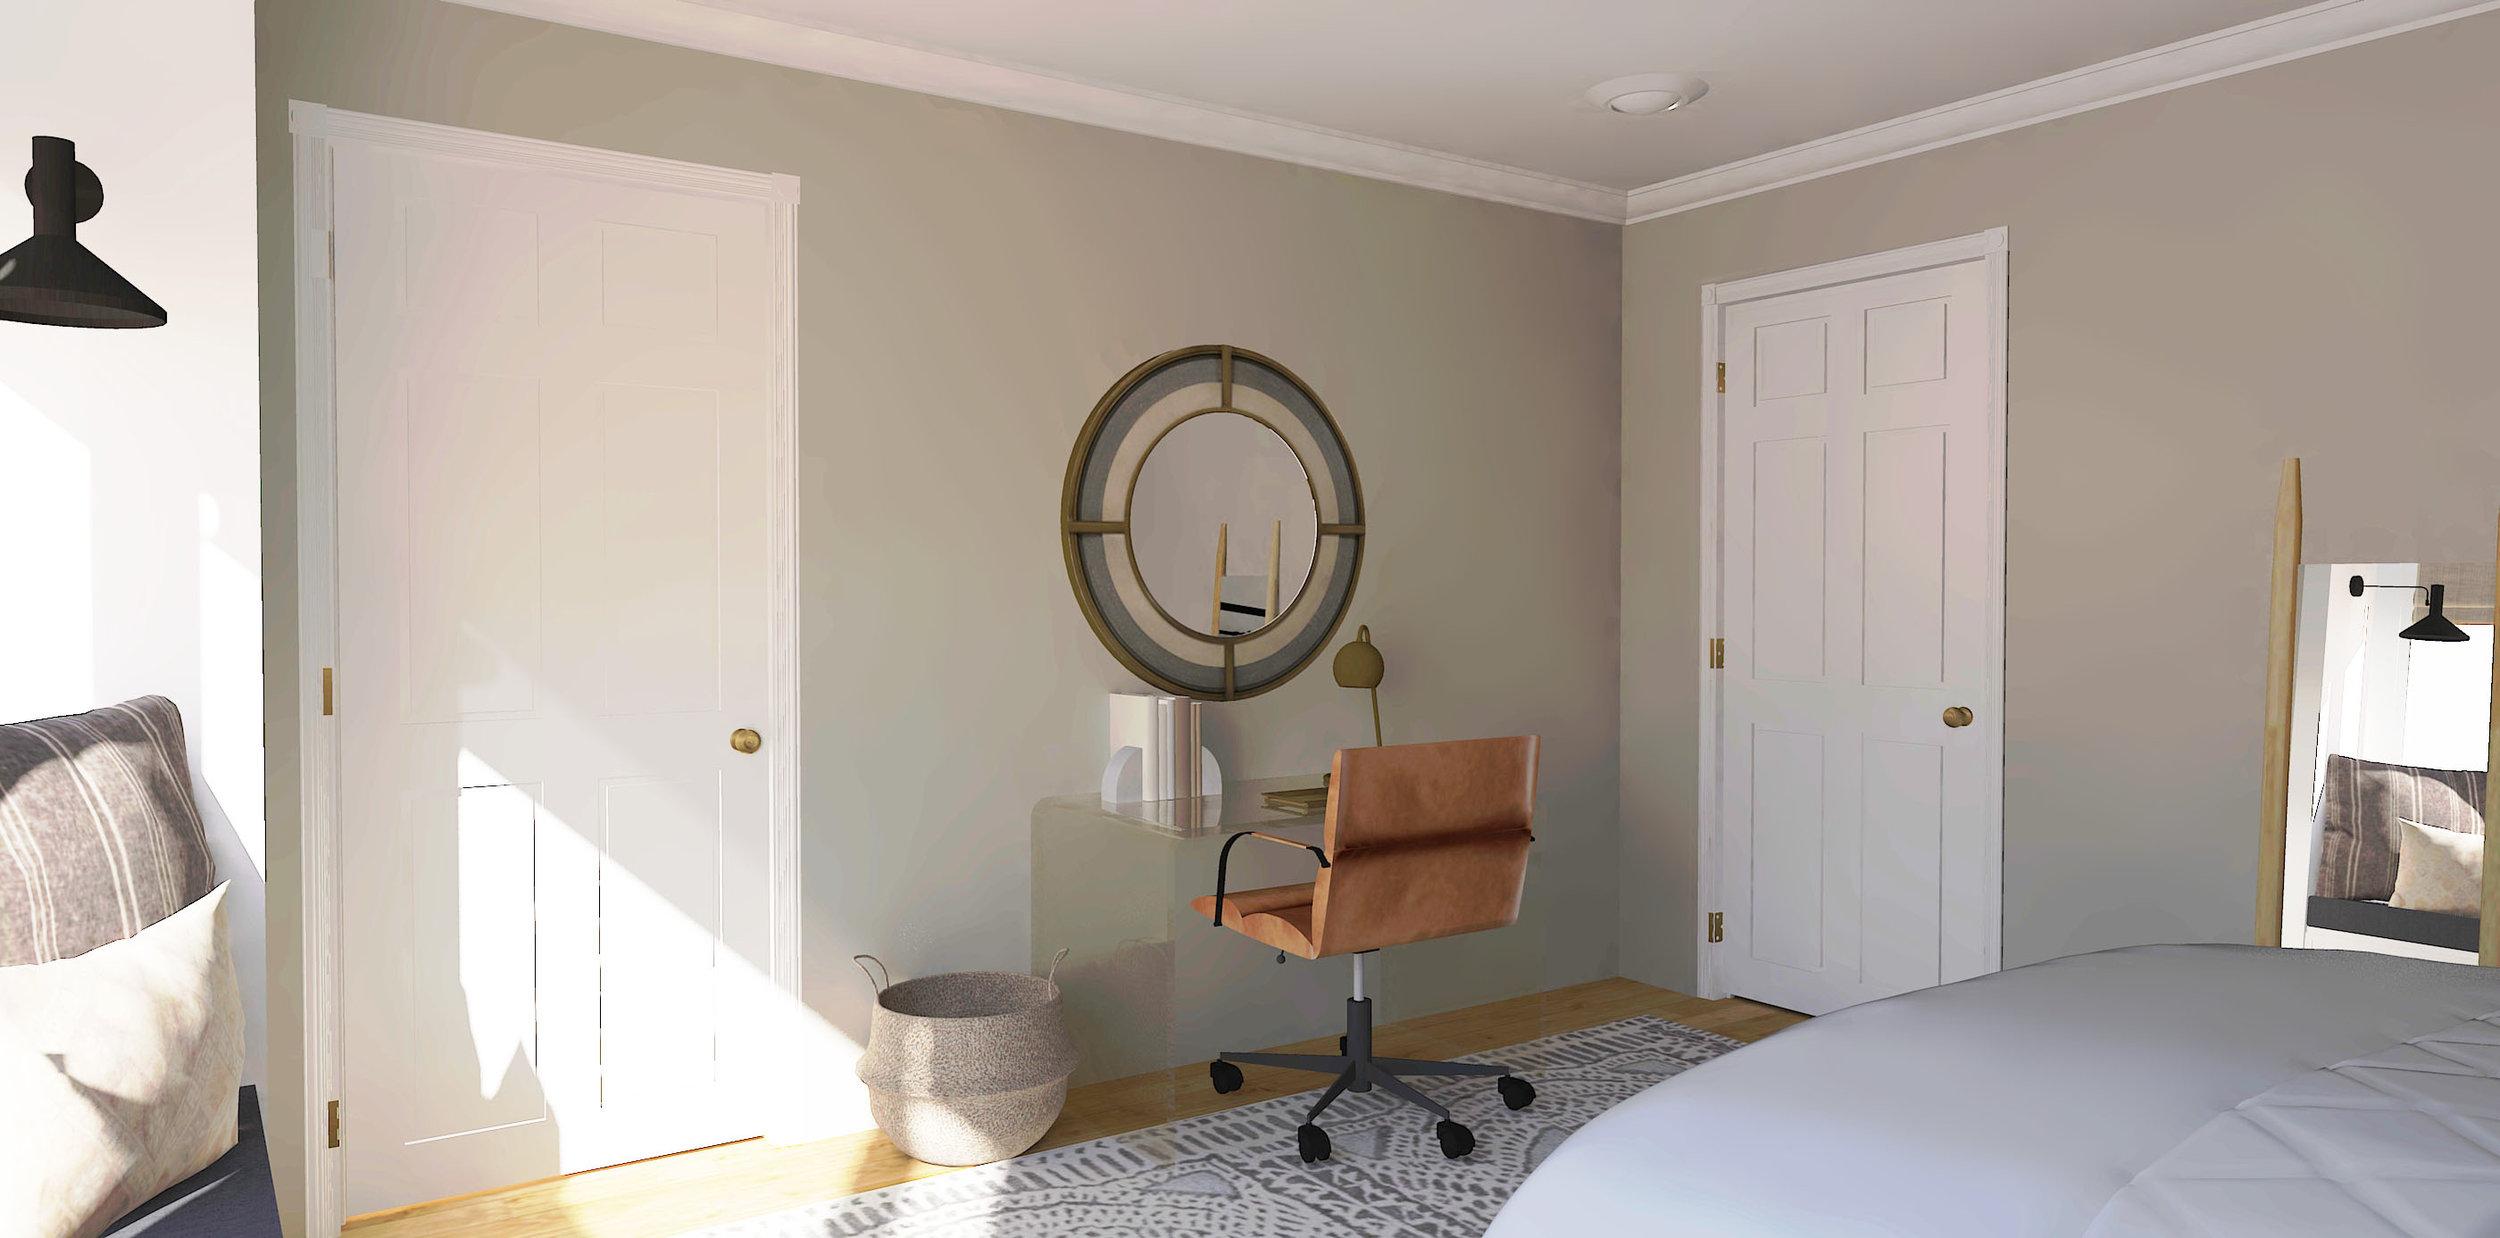 Hill Home Bedroom Rendered 4.jpg